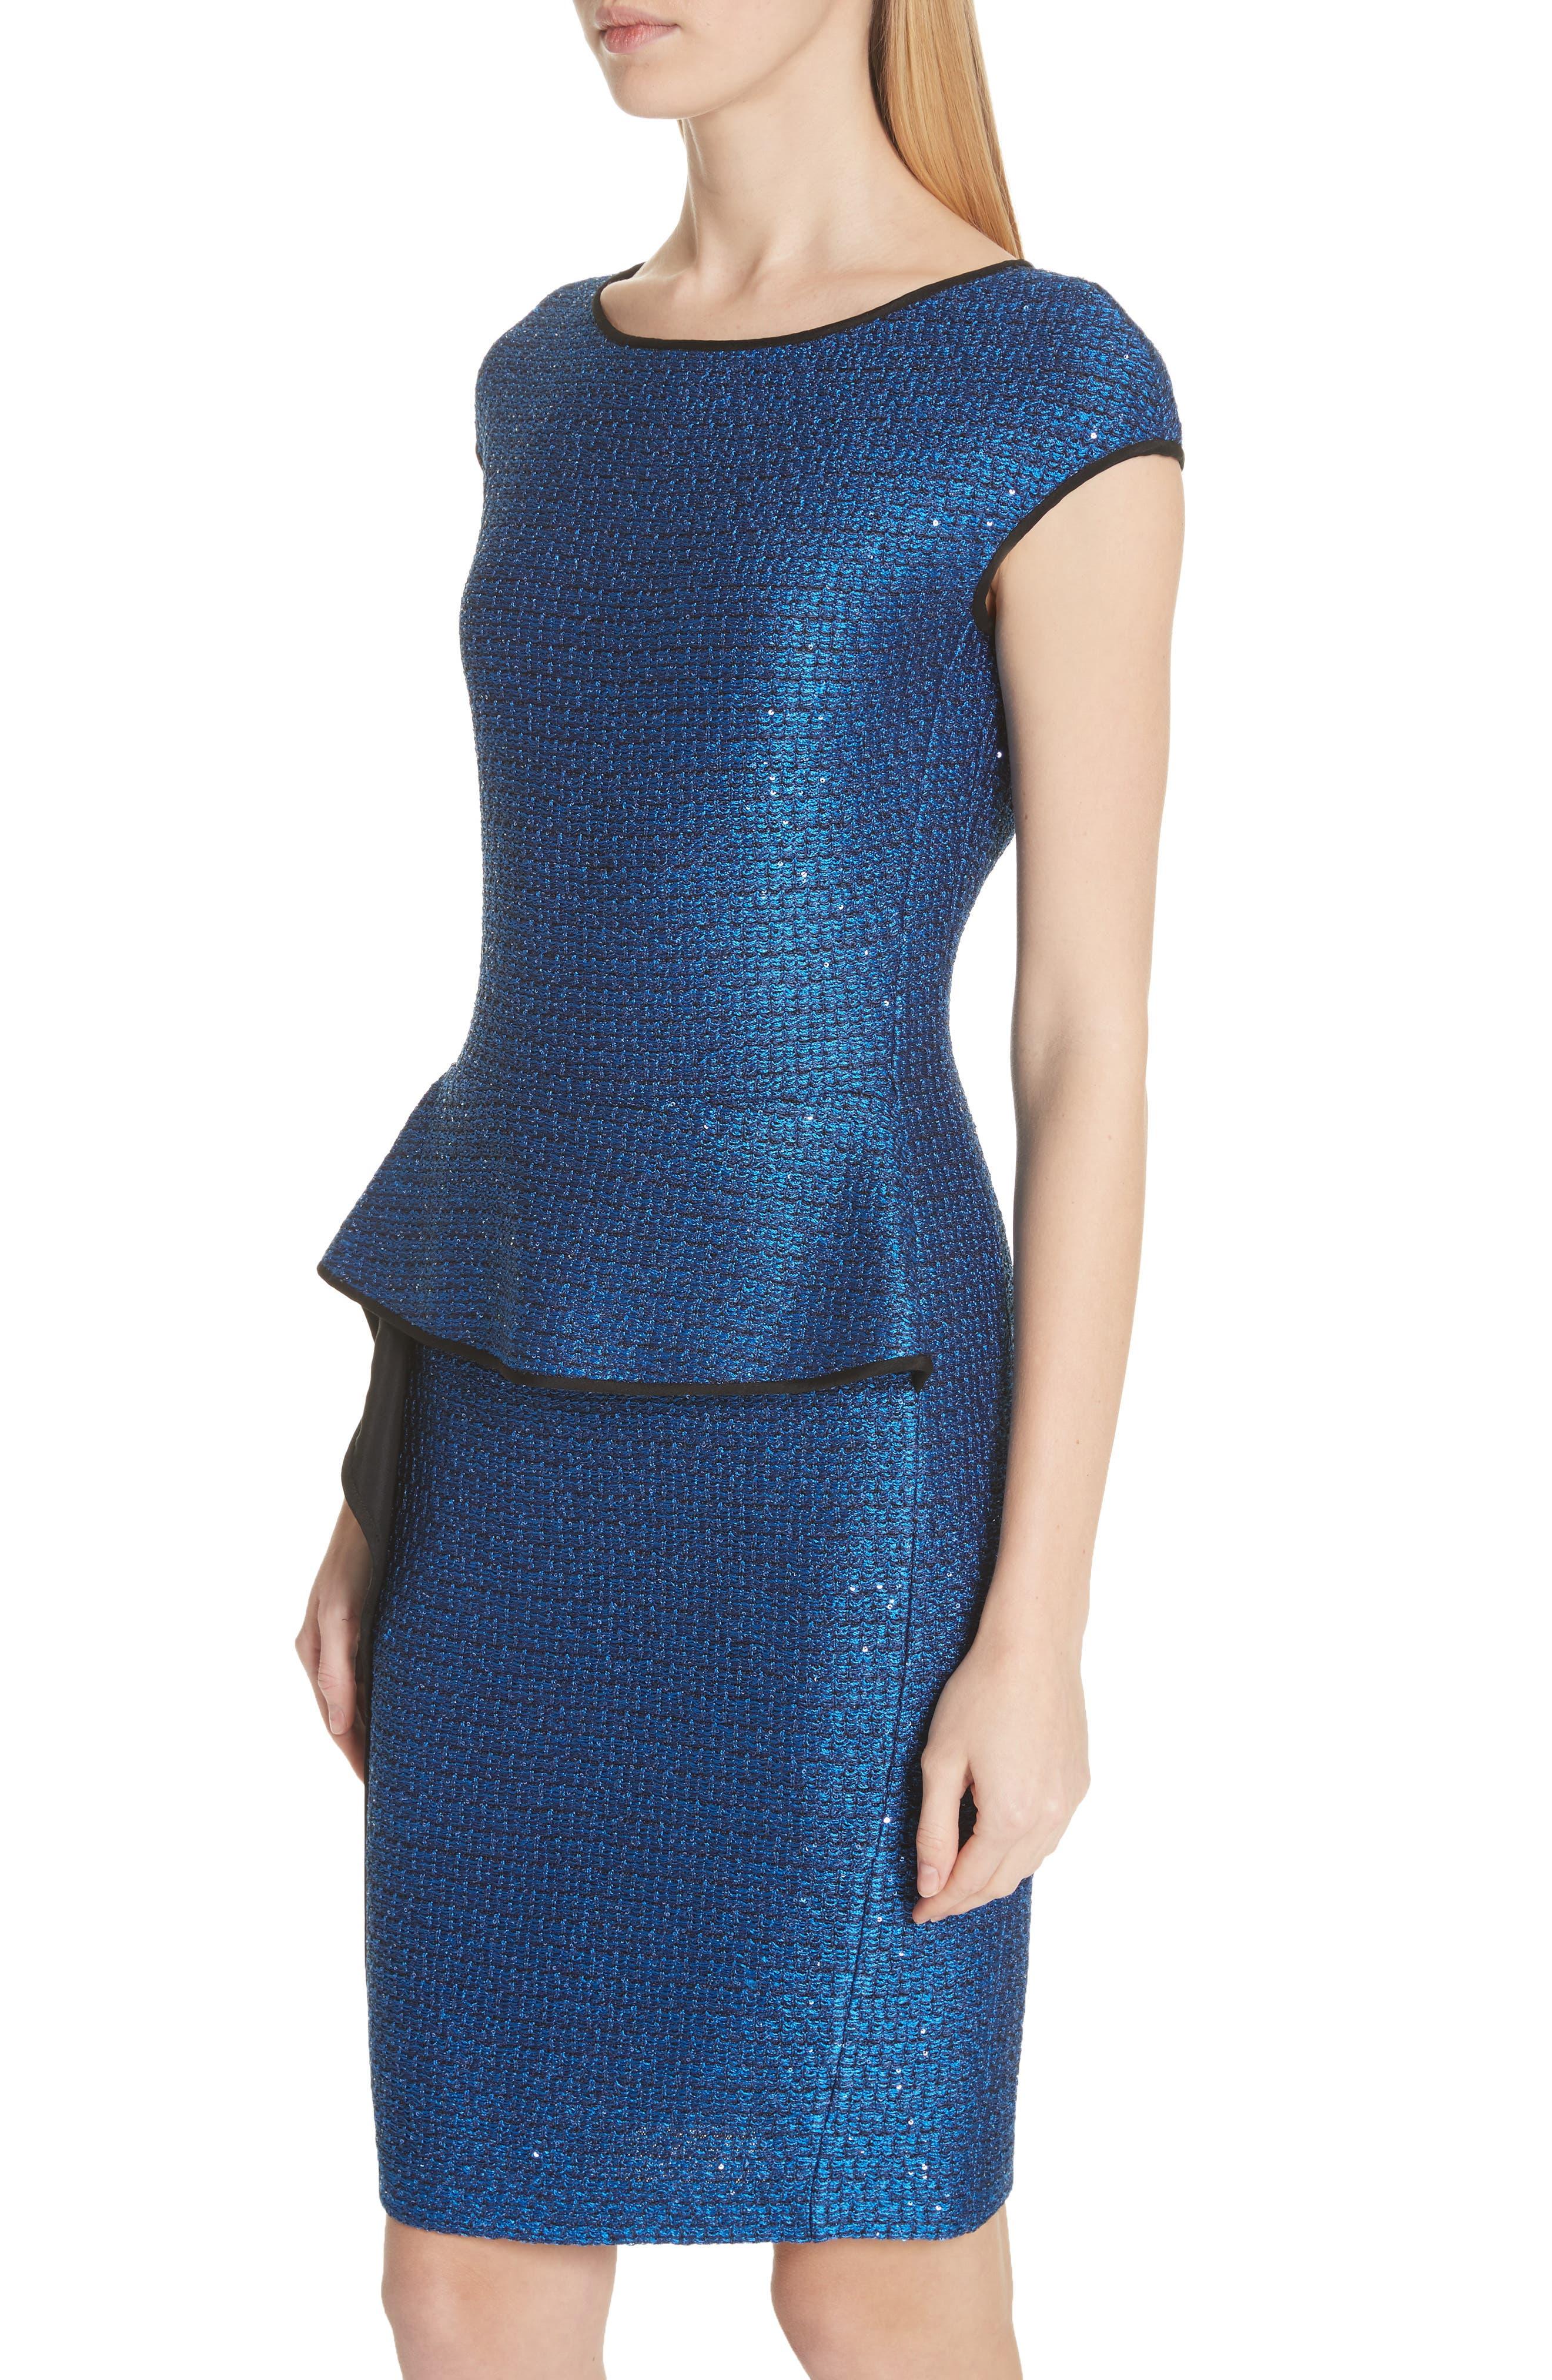 Luster Sequin Knit Dress,                             Alternate thumbnail 4, color,                             Cobalt Multi